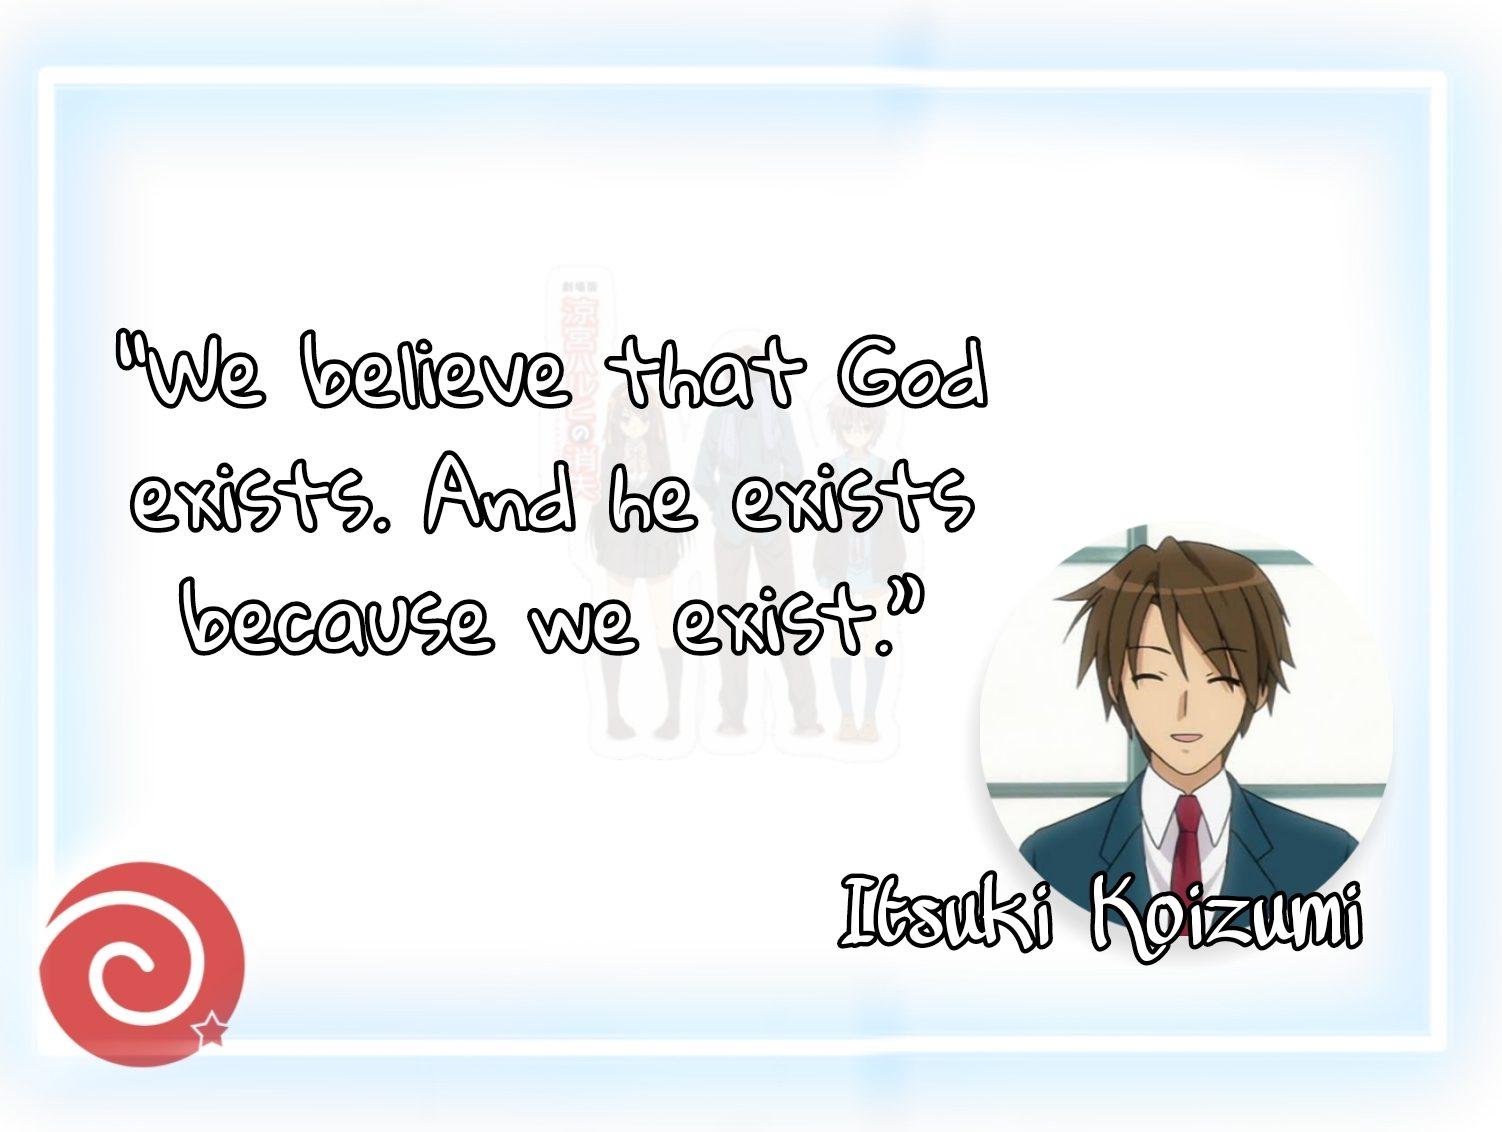 Quote by Itsuki Koizumi